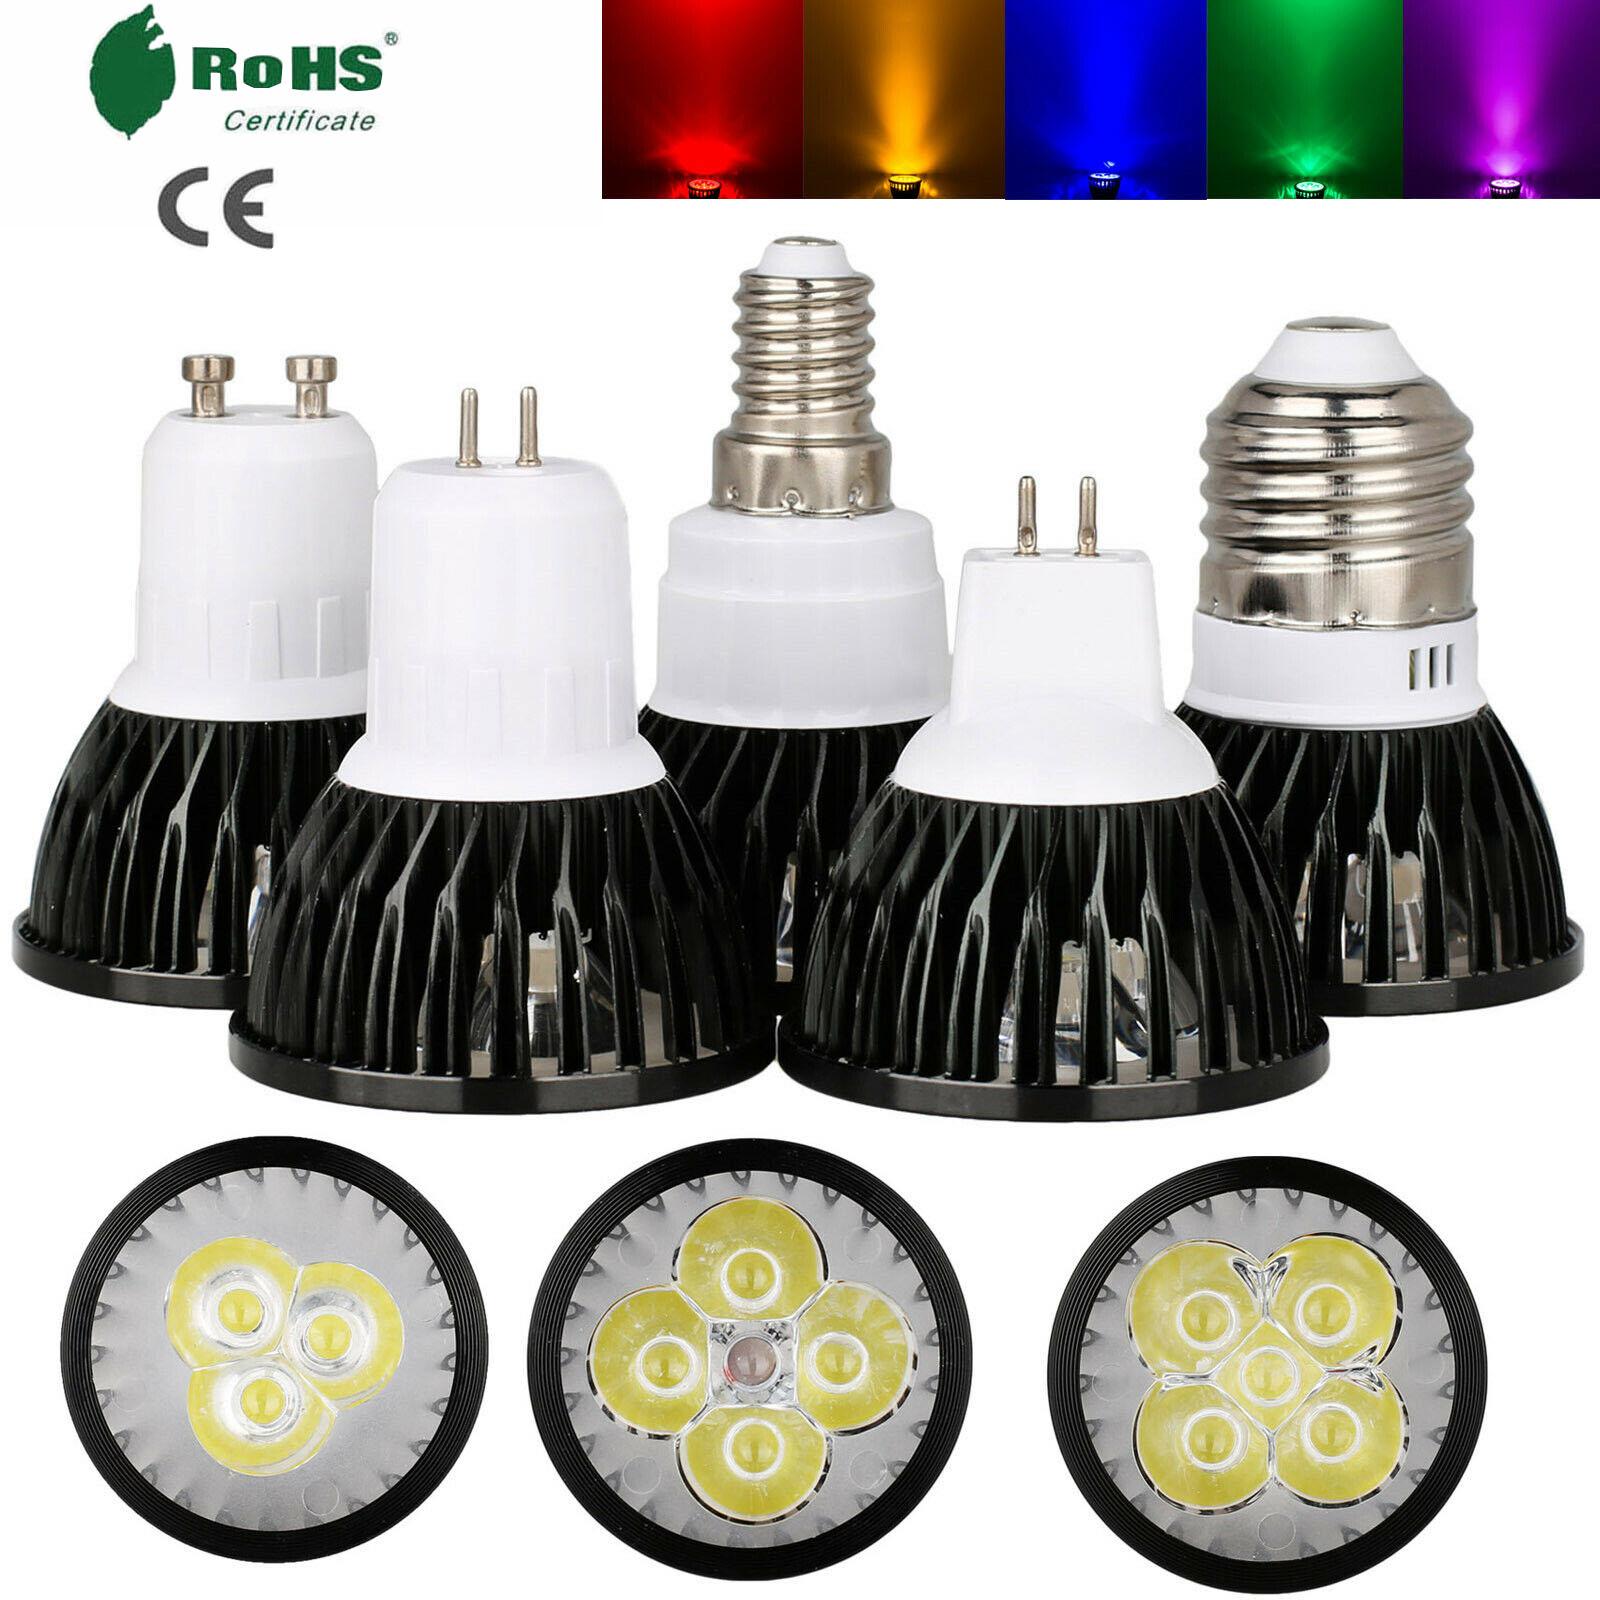 LED Lampada 9W 12W 15W GU10 MR16 GU5.3 E27 E26 E12 LED Bulb 85-265V 12V  Led Spotlight Red Yellow Blue Green Purple LED Lamp